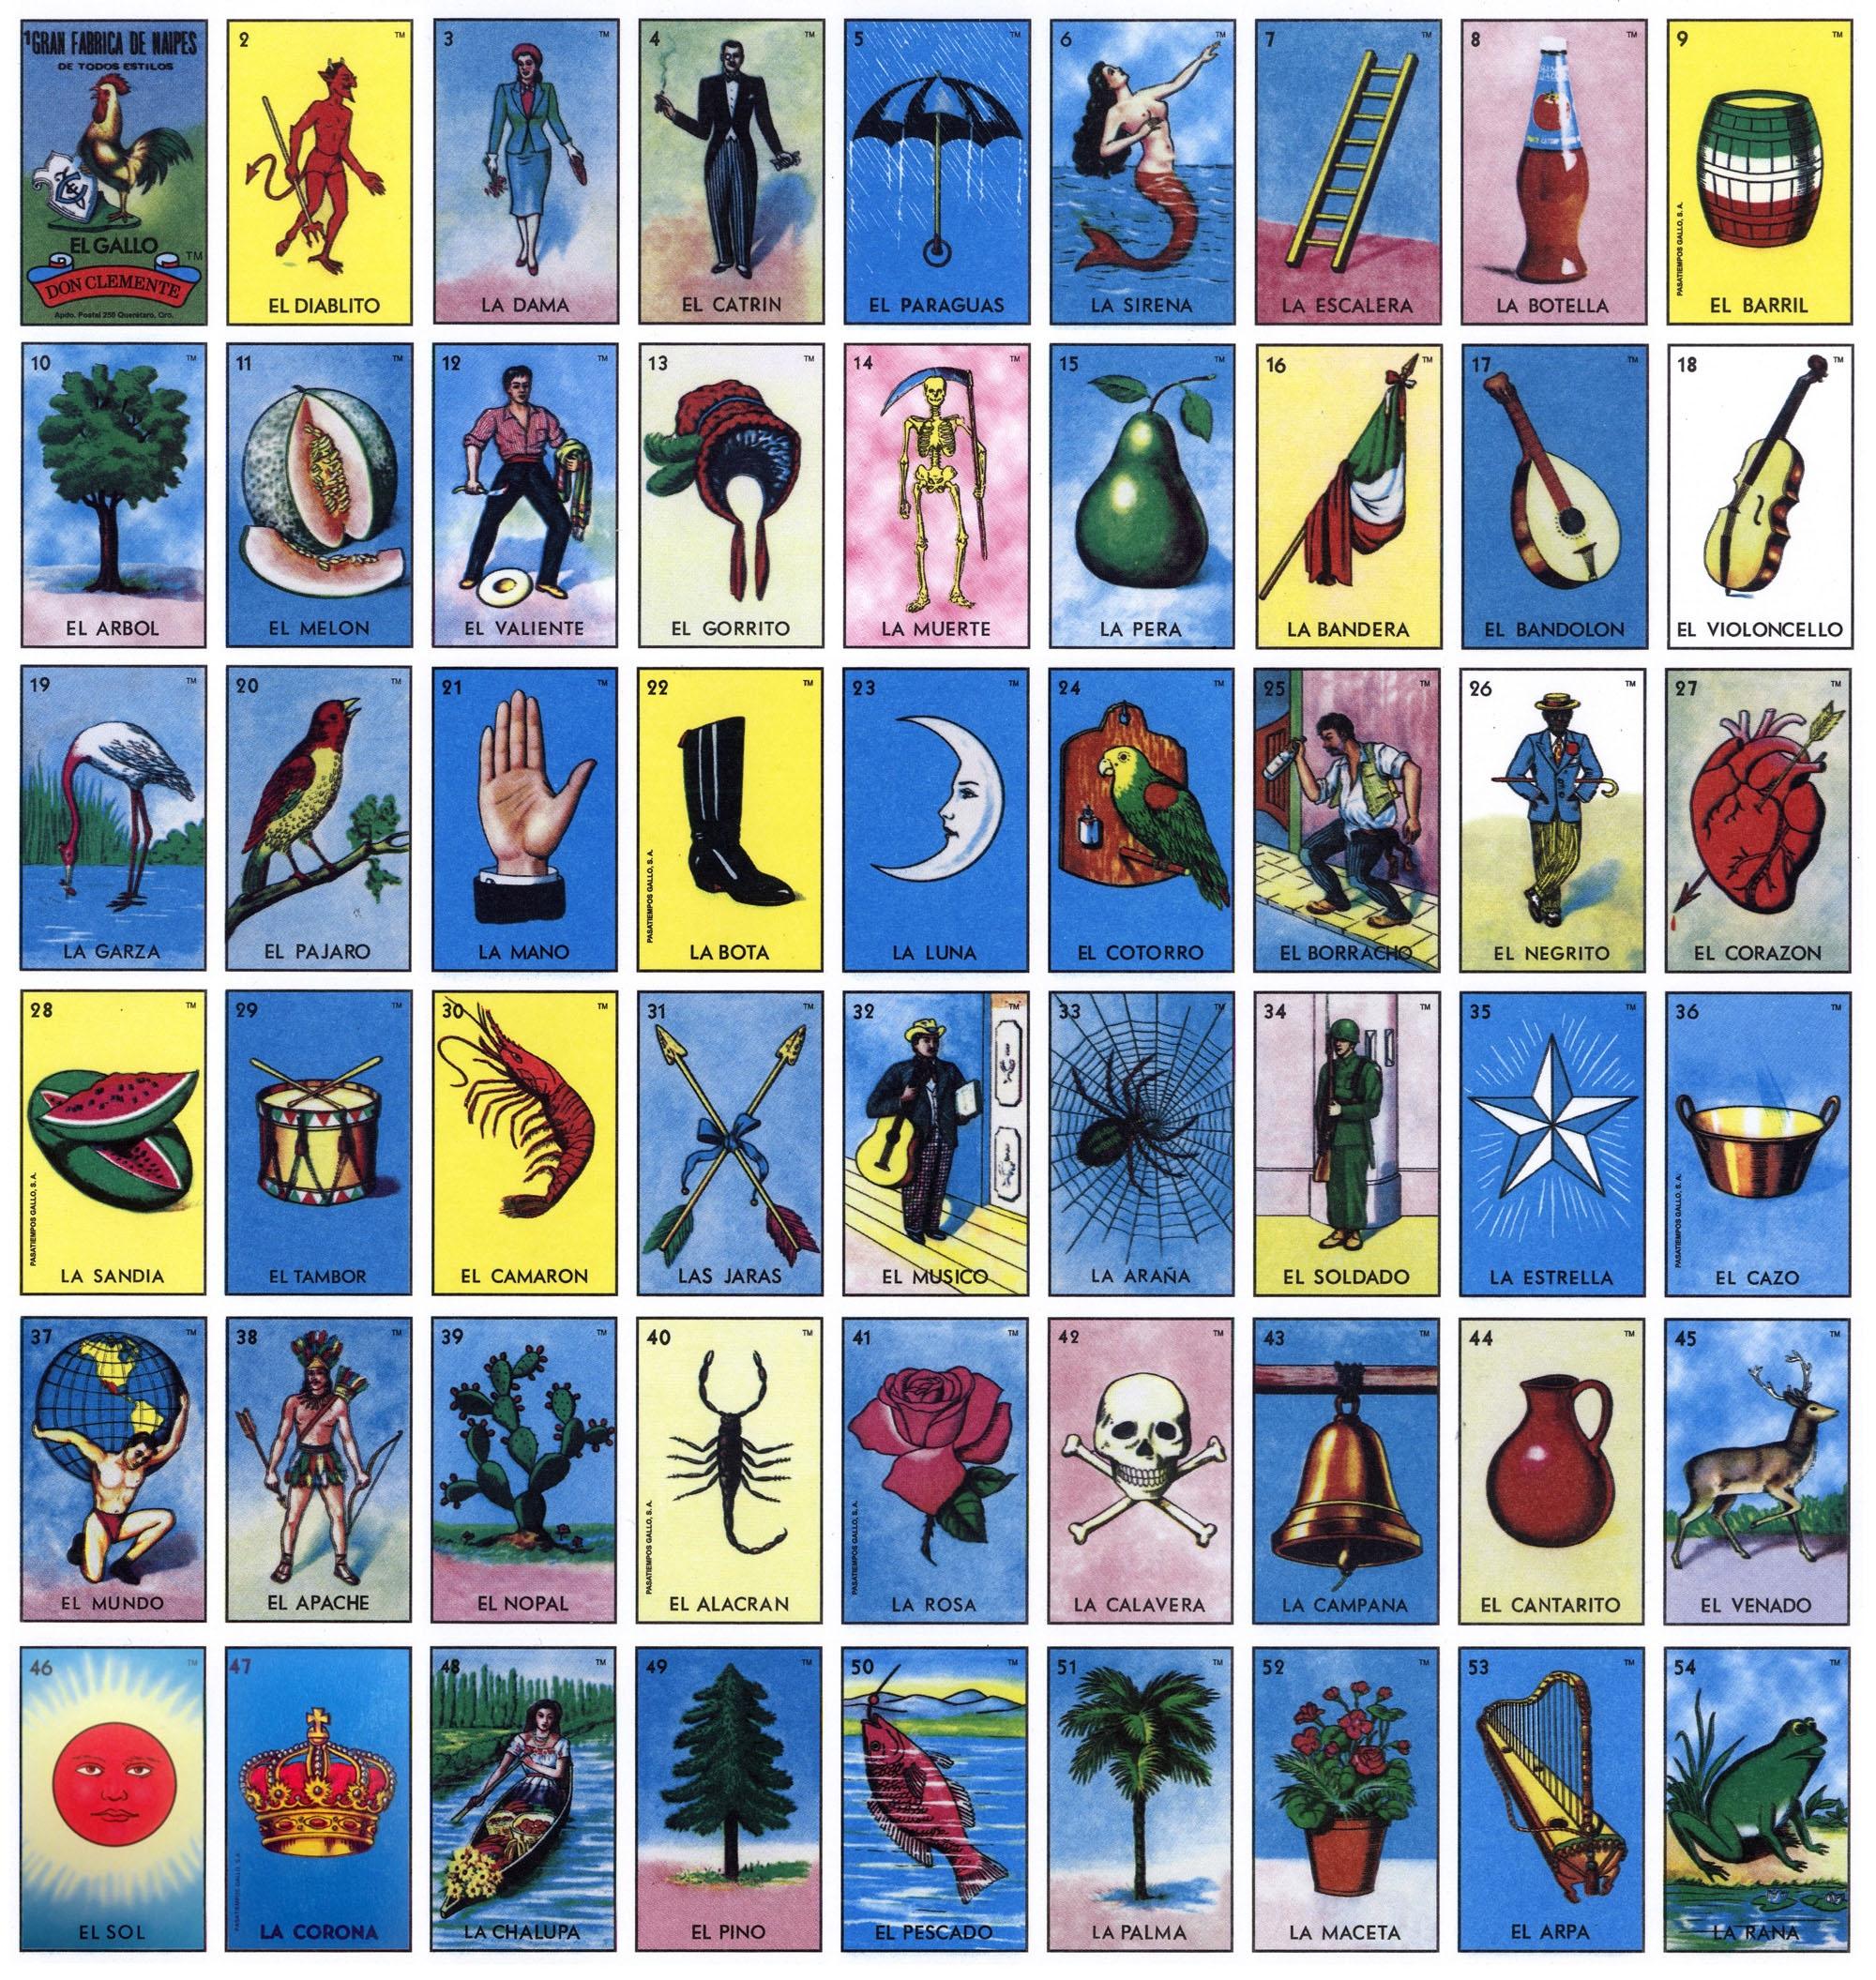 Free Printable Loteria Cards   Health-Symptoms-And-Cure - Loteria Printable Cards Free